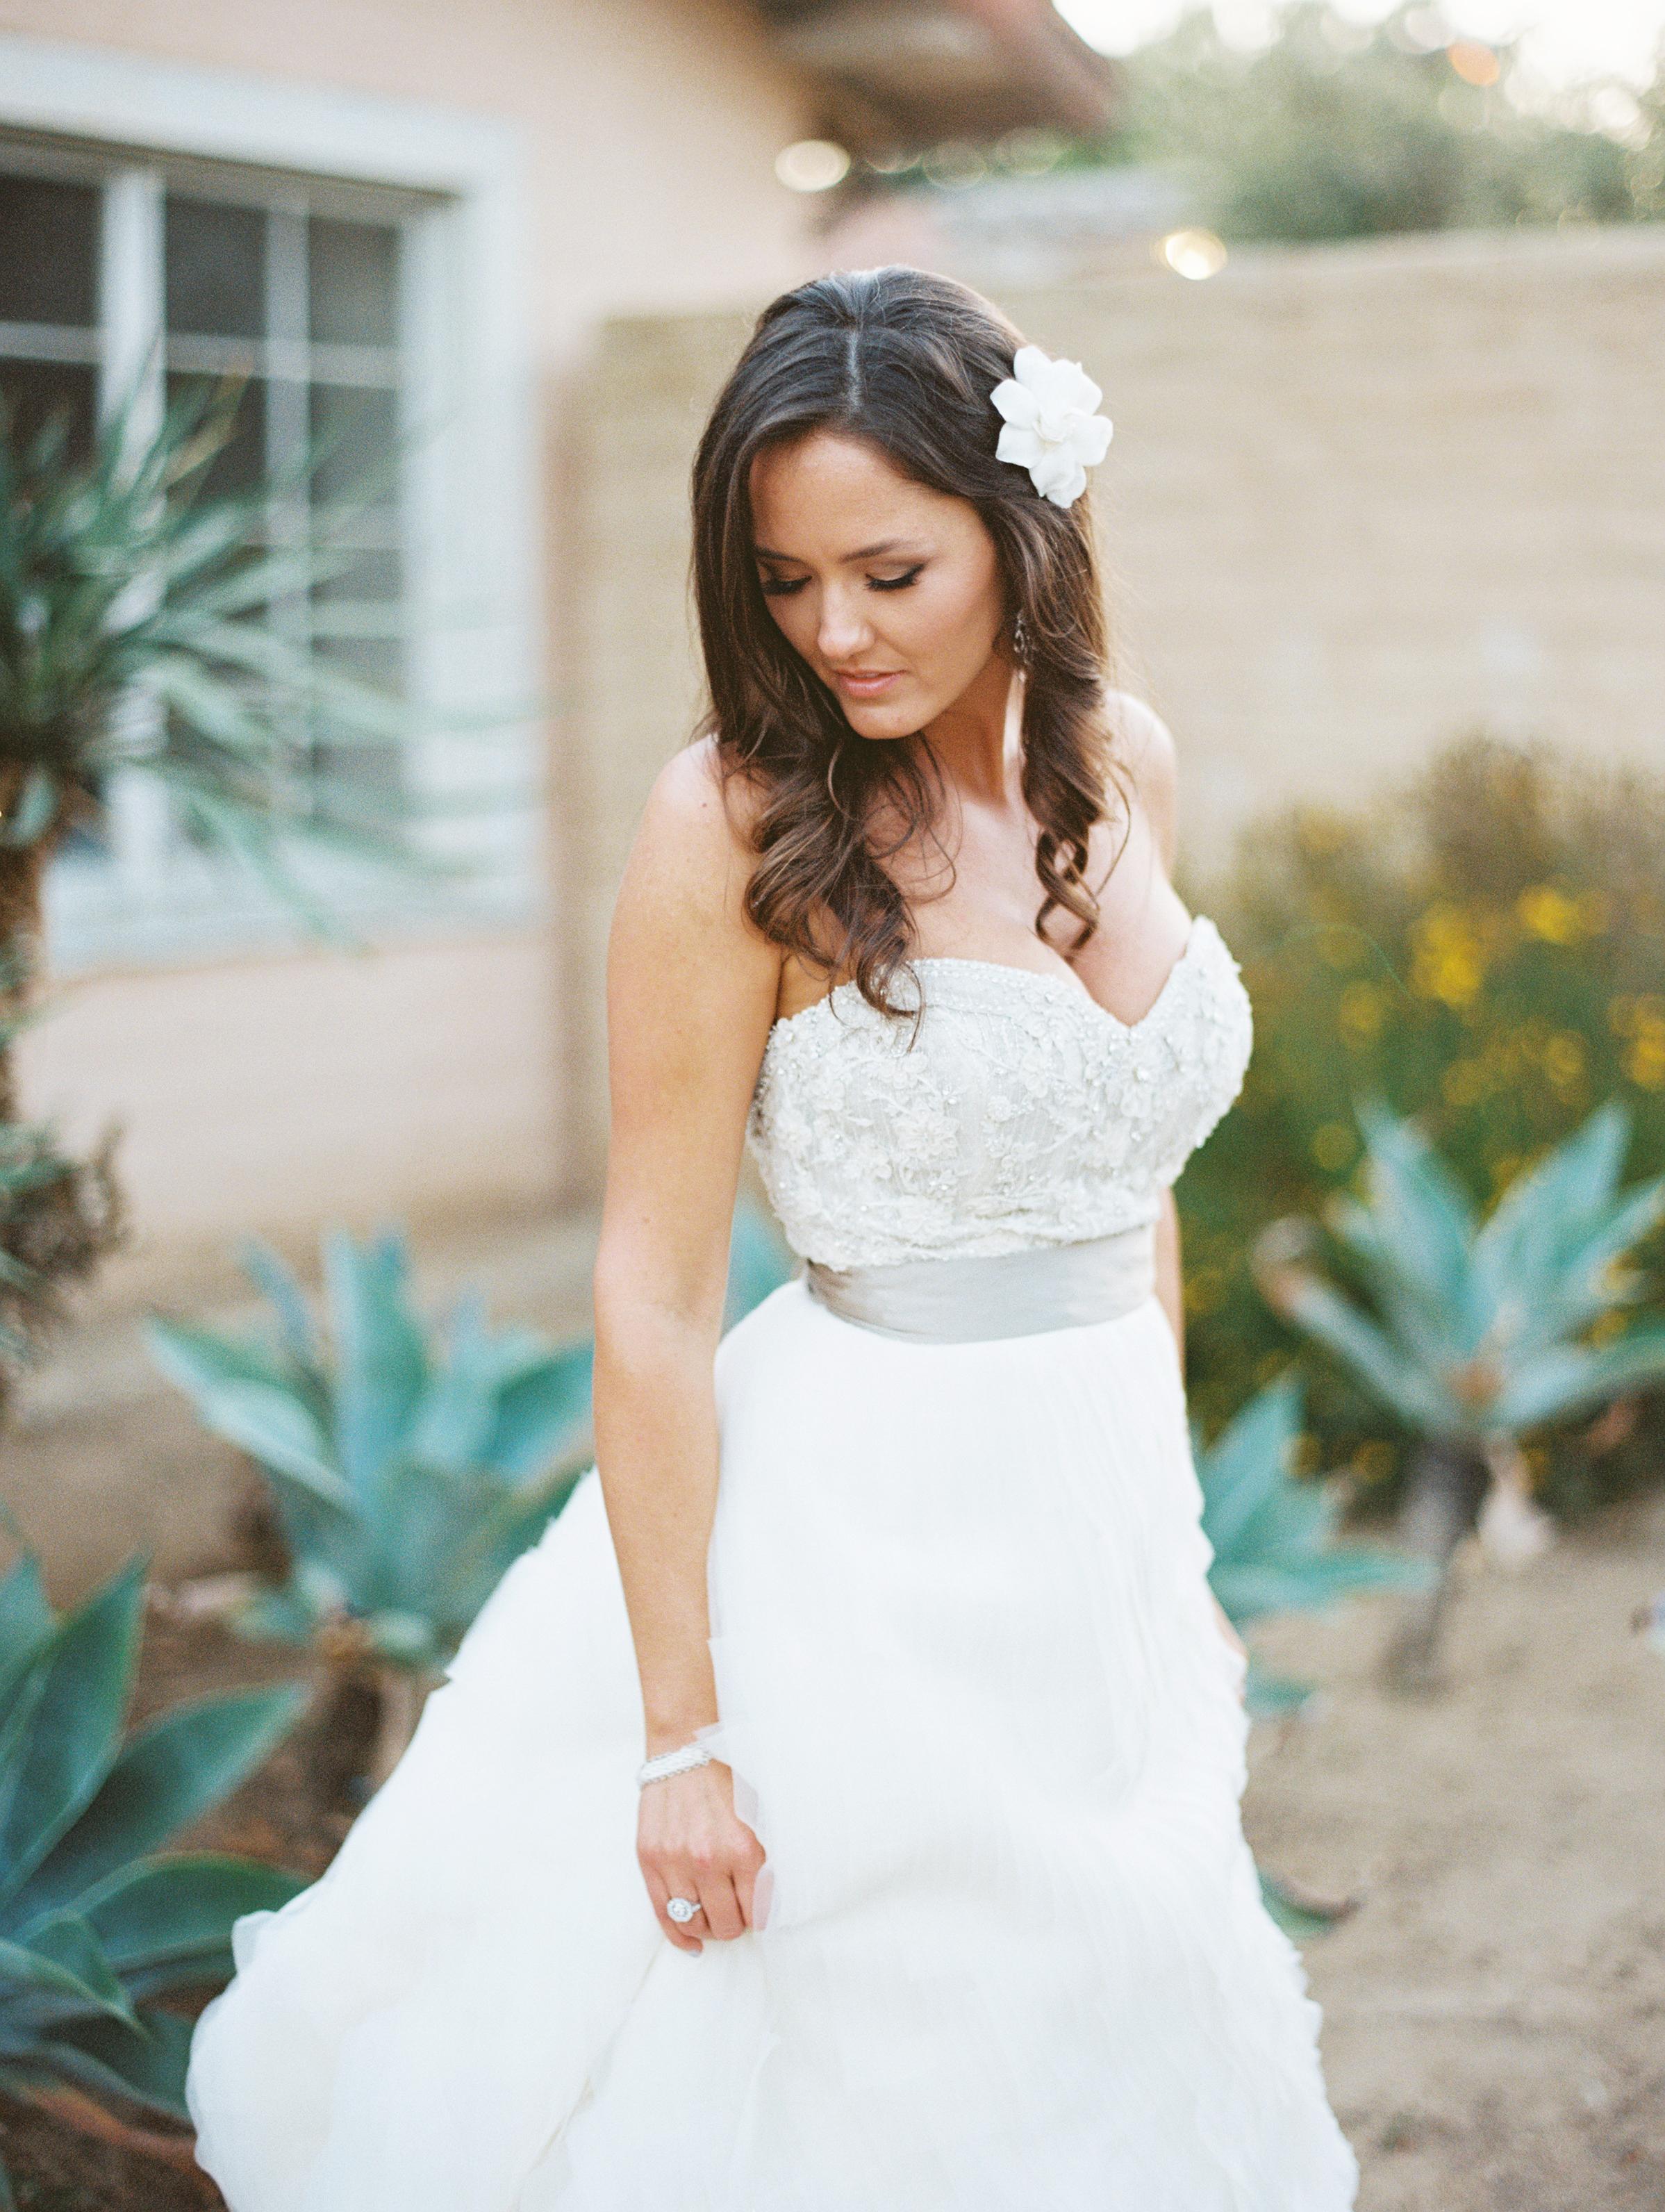 www.santabarbarawedding.com | Pat Moyer Wedding Photography & Films | Santa Barbara Historical Museum | Magnolia Weddings | Camiella Floral Designs | Bride